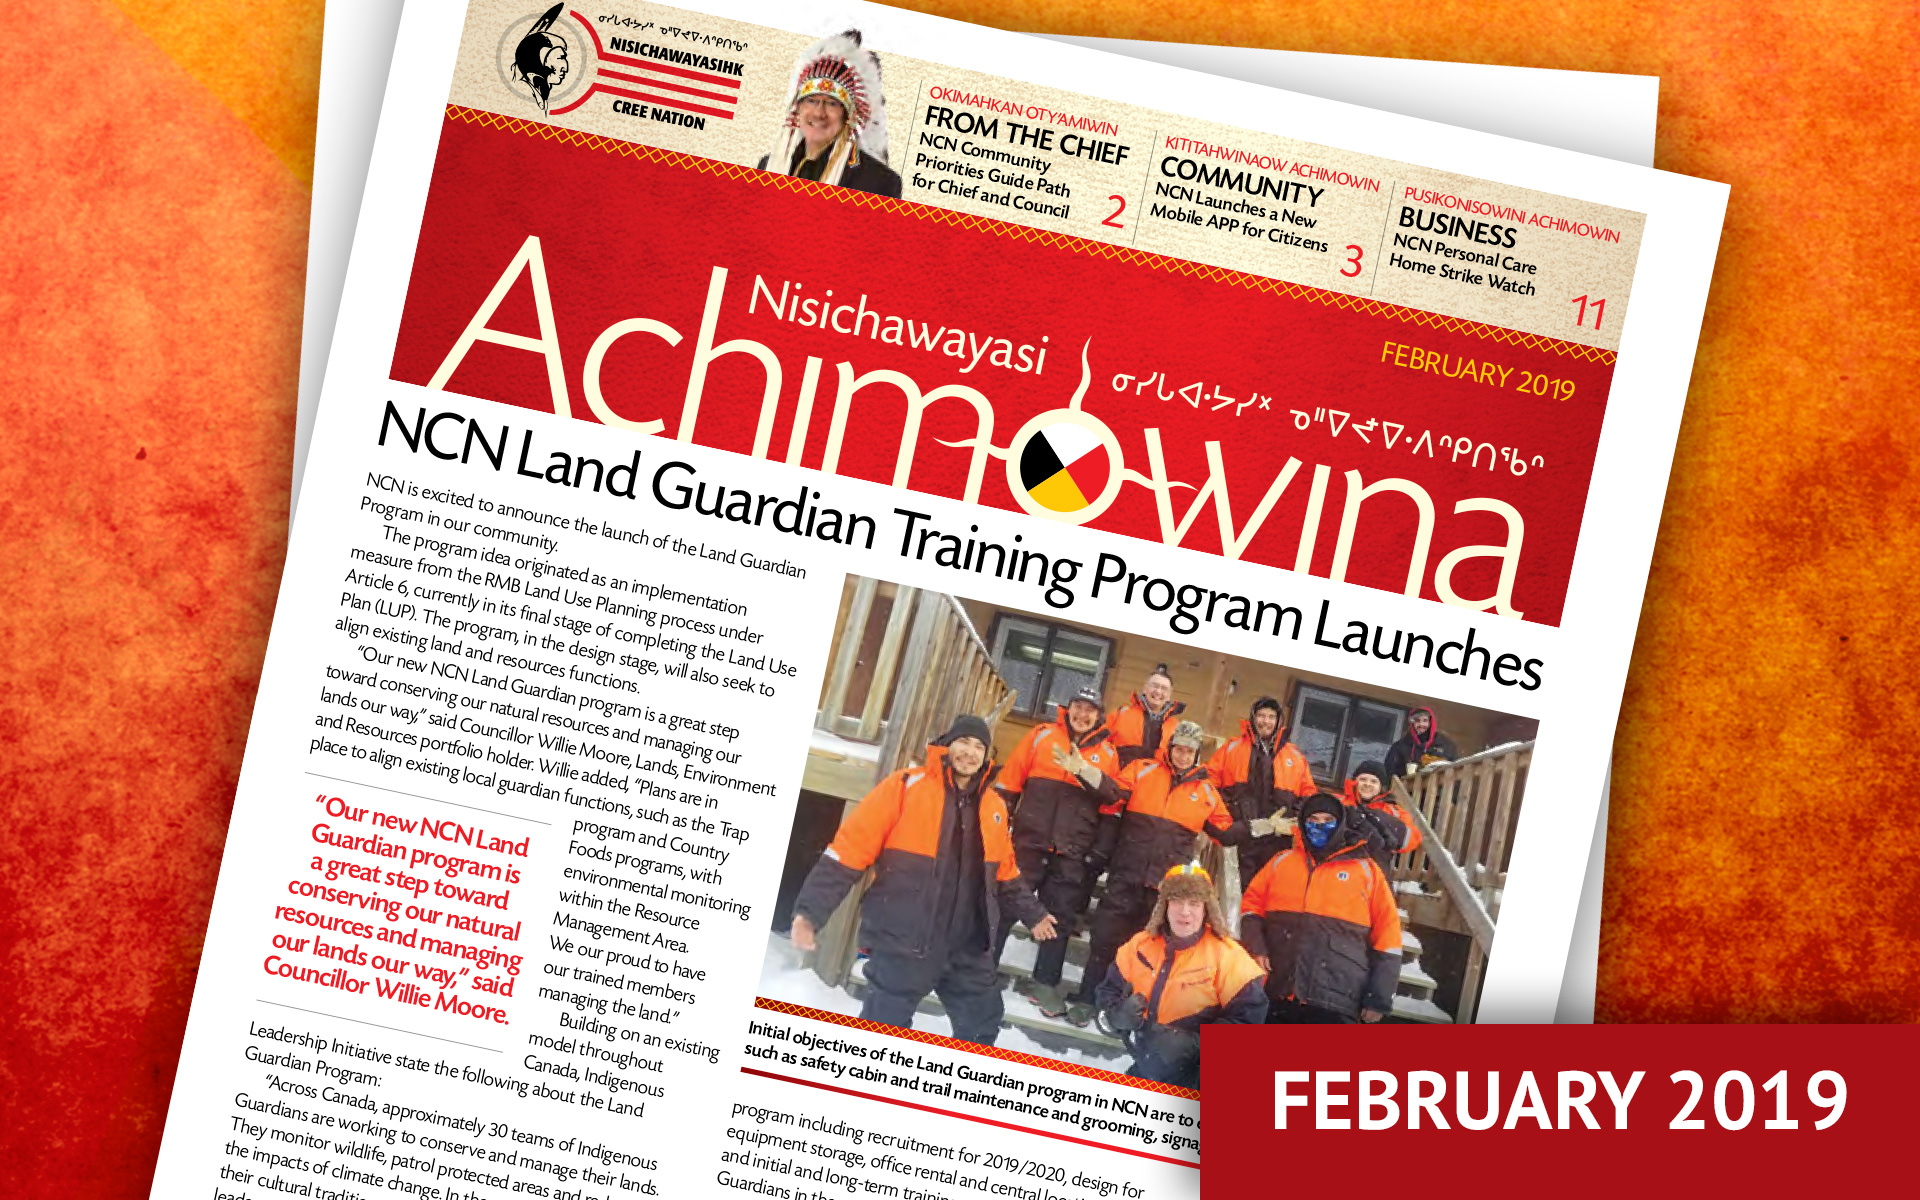 Achimowina February 2019